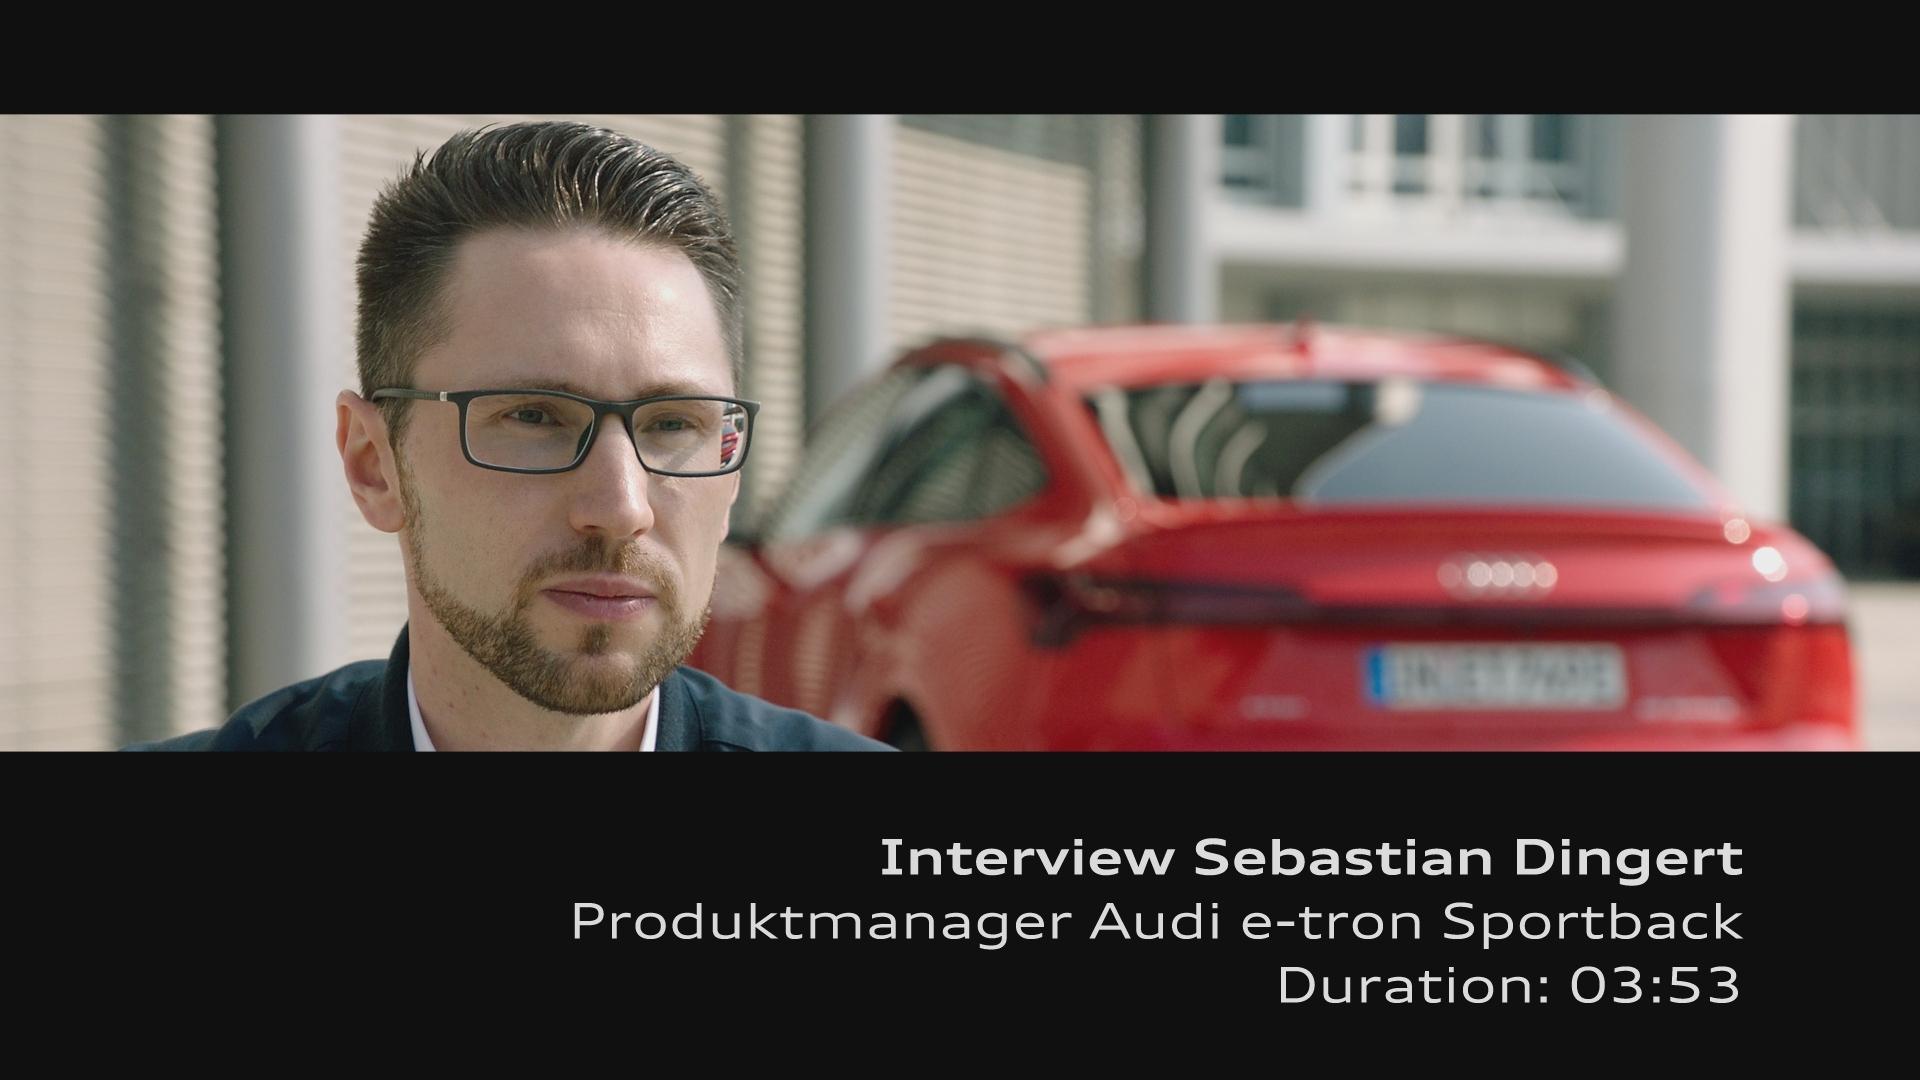 Interview Sebastian Dingert / Audi e-tron Sportback